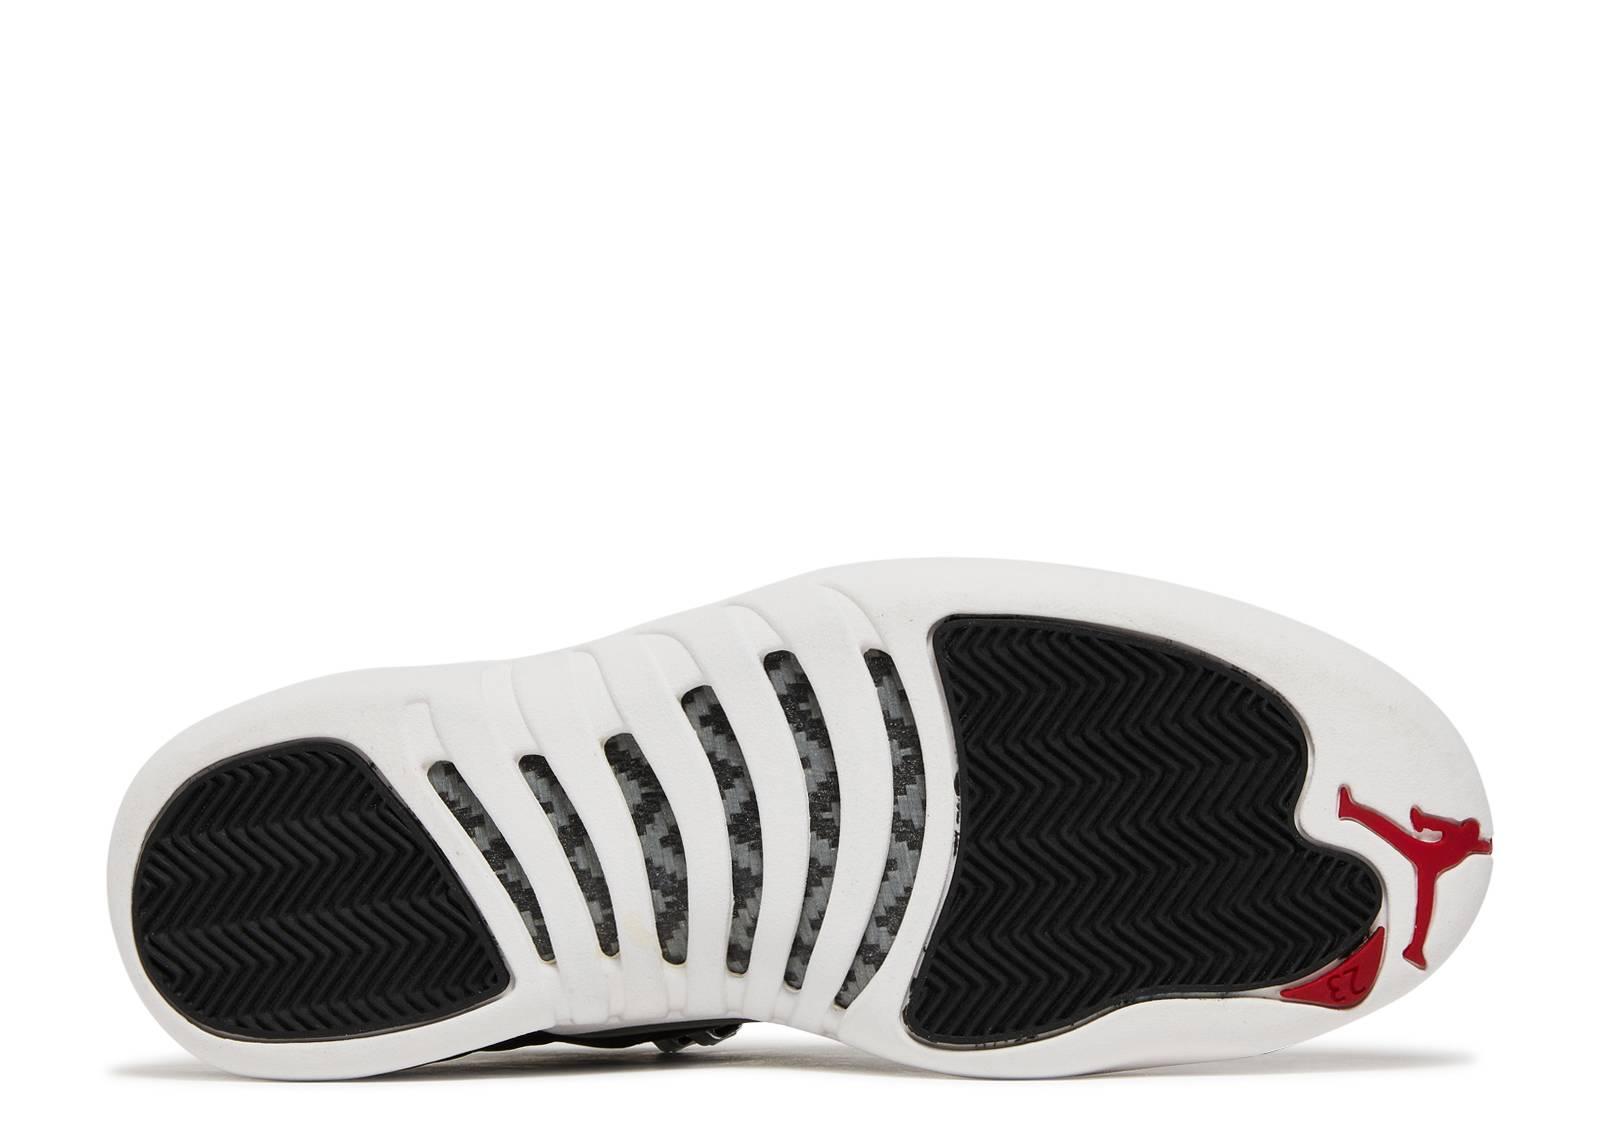 finest selection 507b7 c4da6 Air Jordan 12 Retro